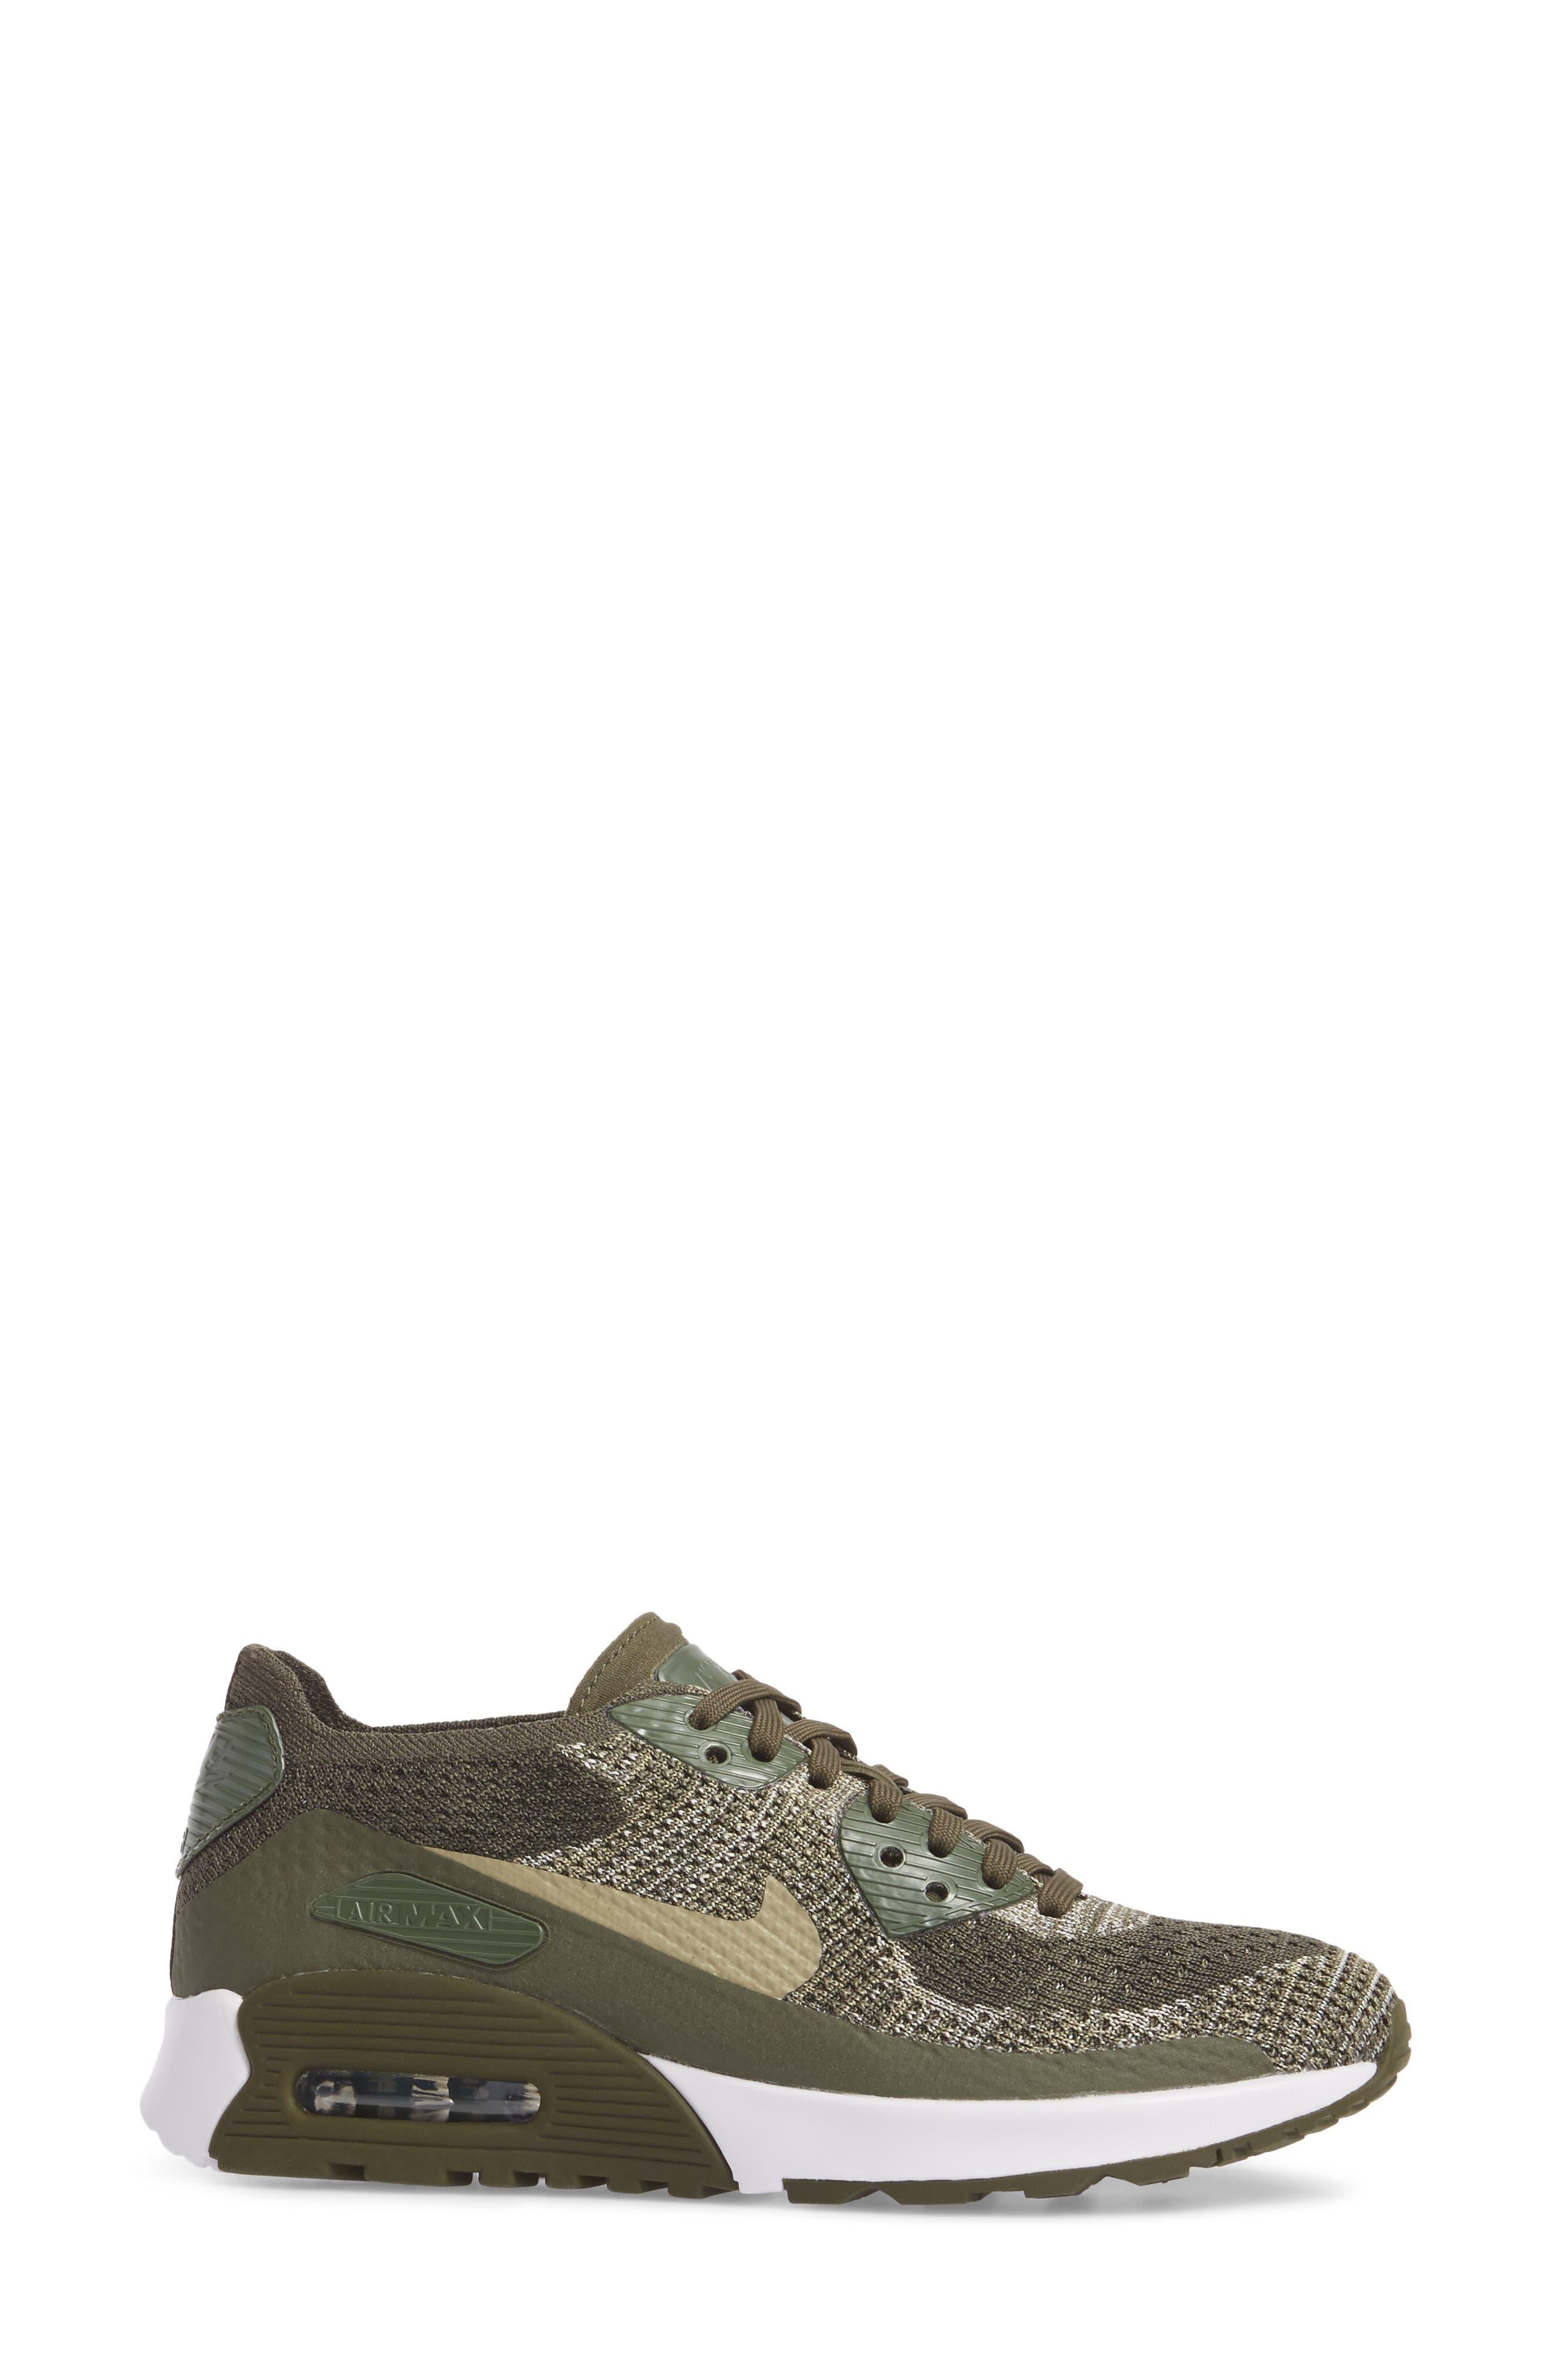 Air Max 90 Flyknit Ultra 2.0 Sneaker,                             Alternate thumbnail 3, color,                             Cargo Khaki/ Neutral Olive